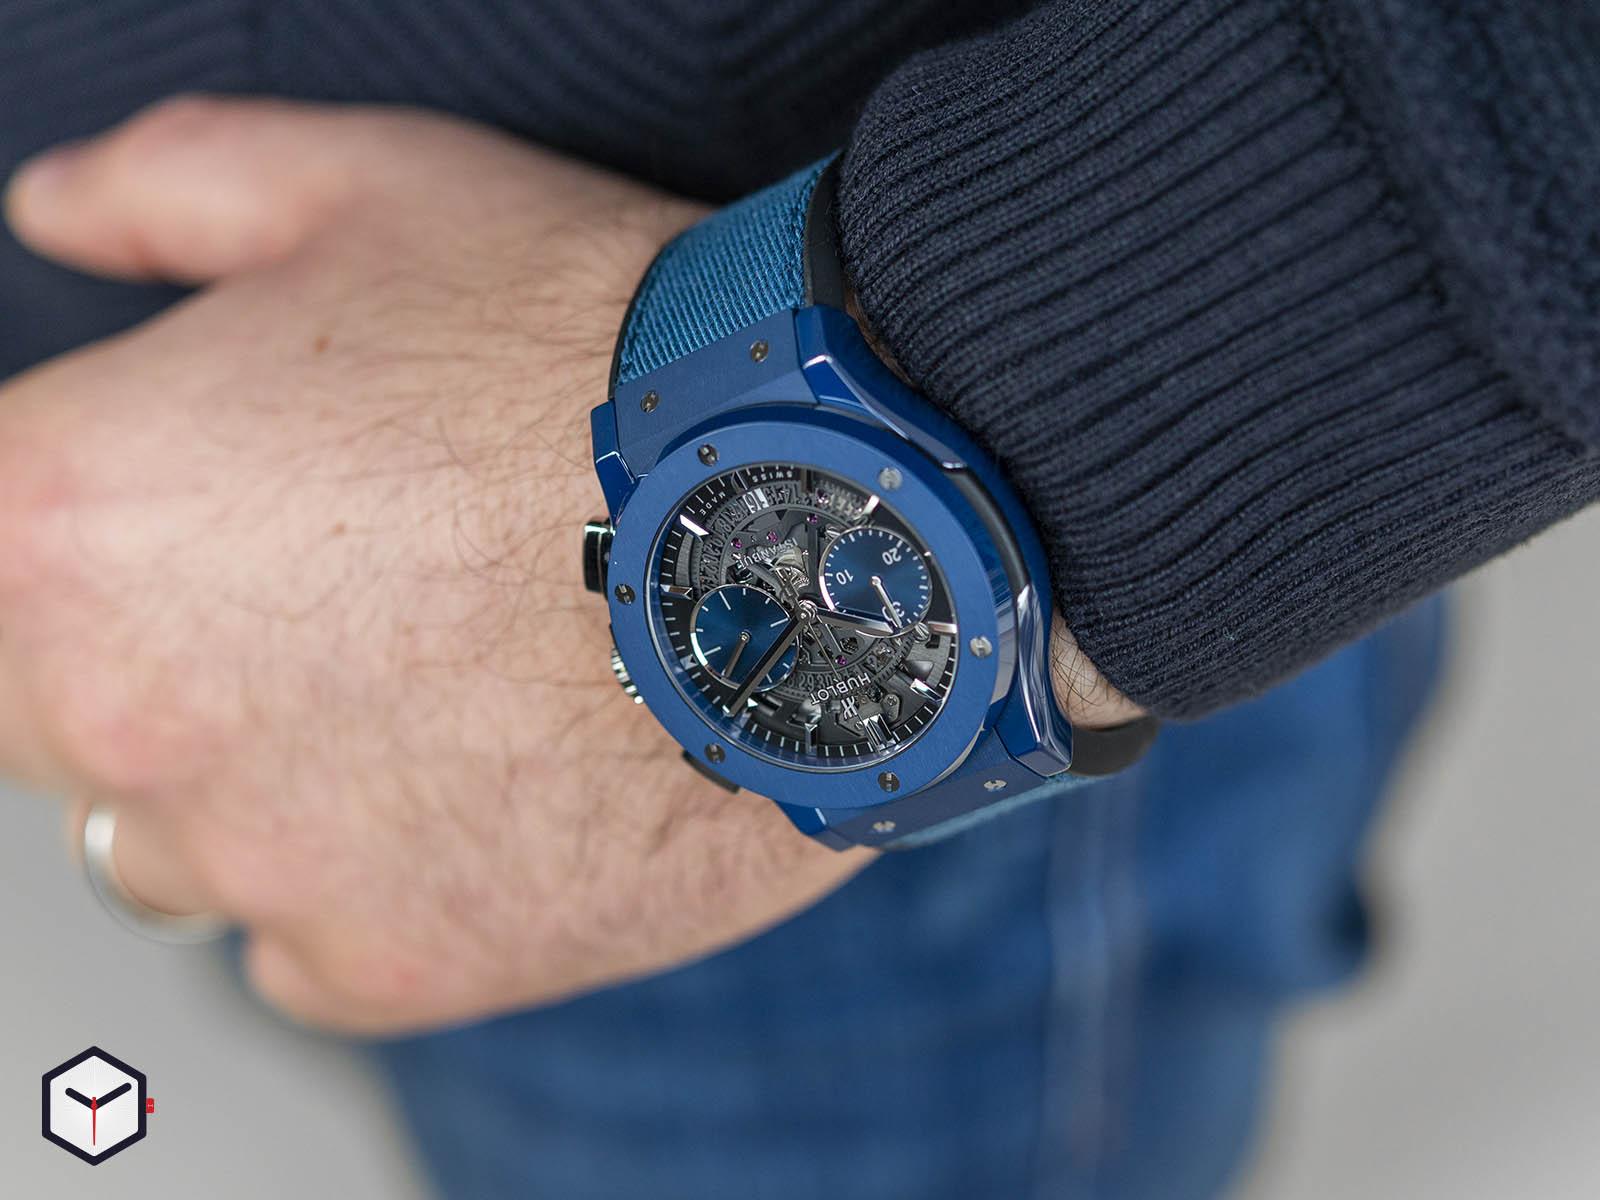 525-ex-1170-nr-bod18-hublot-classic-fusion-aerofusion-bosphorus-blue-11.jpg